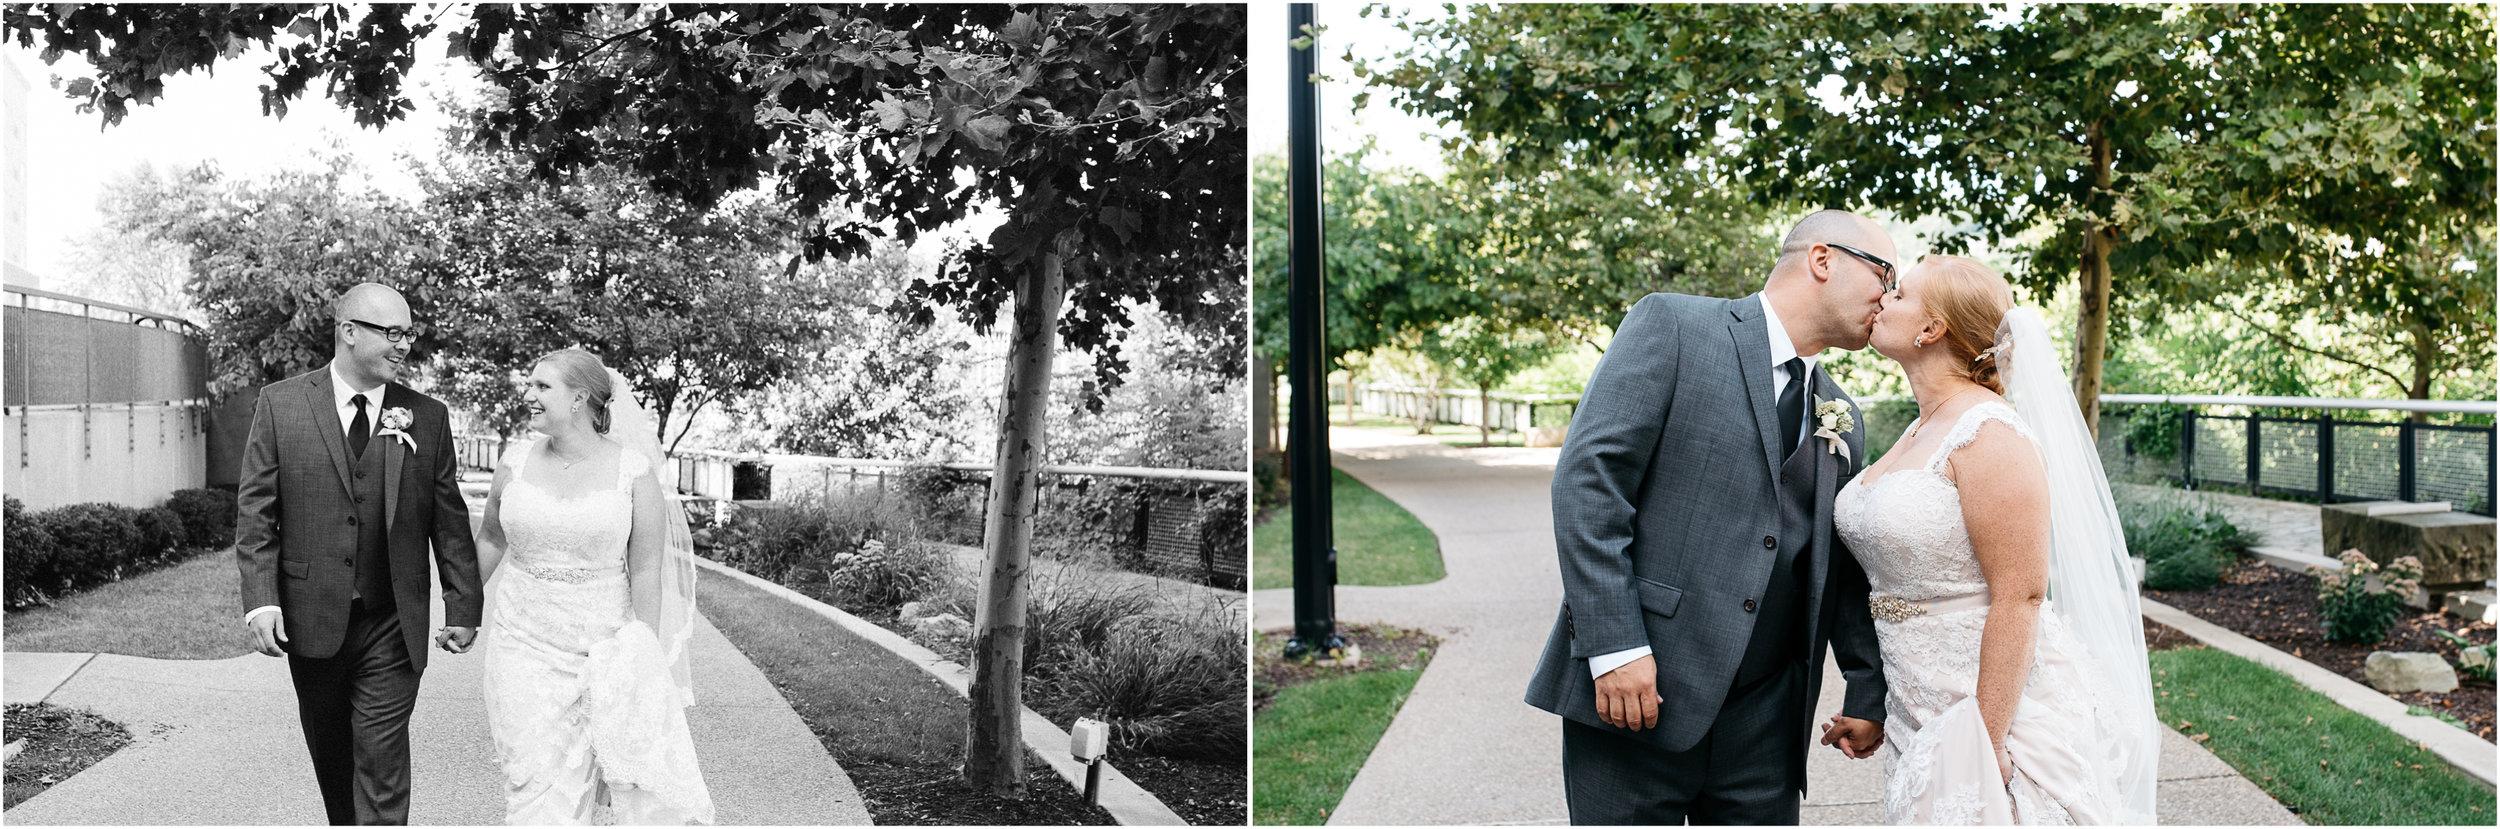 wedding formal portraits.jpg